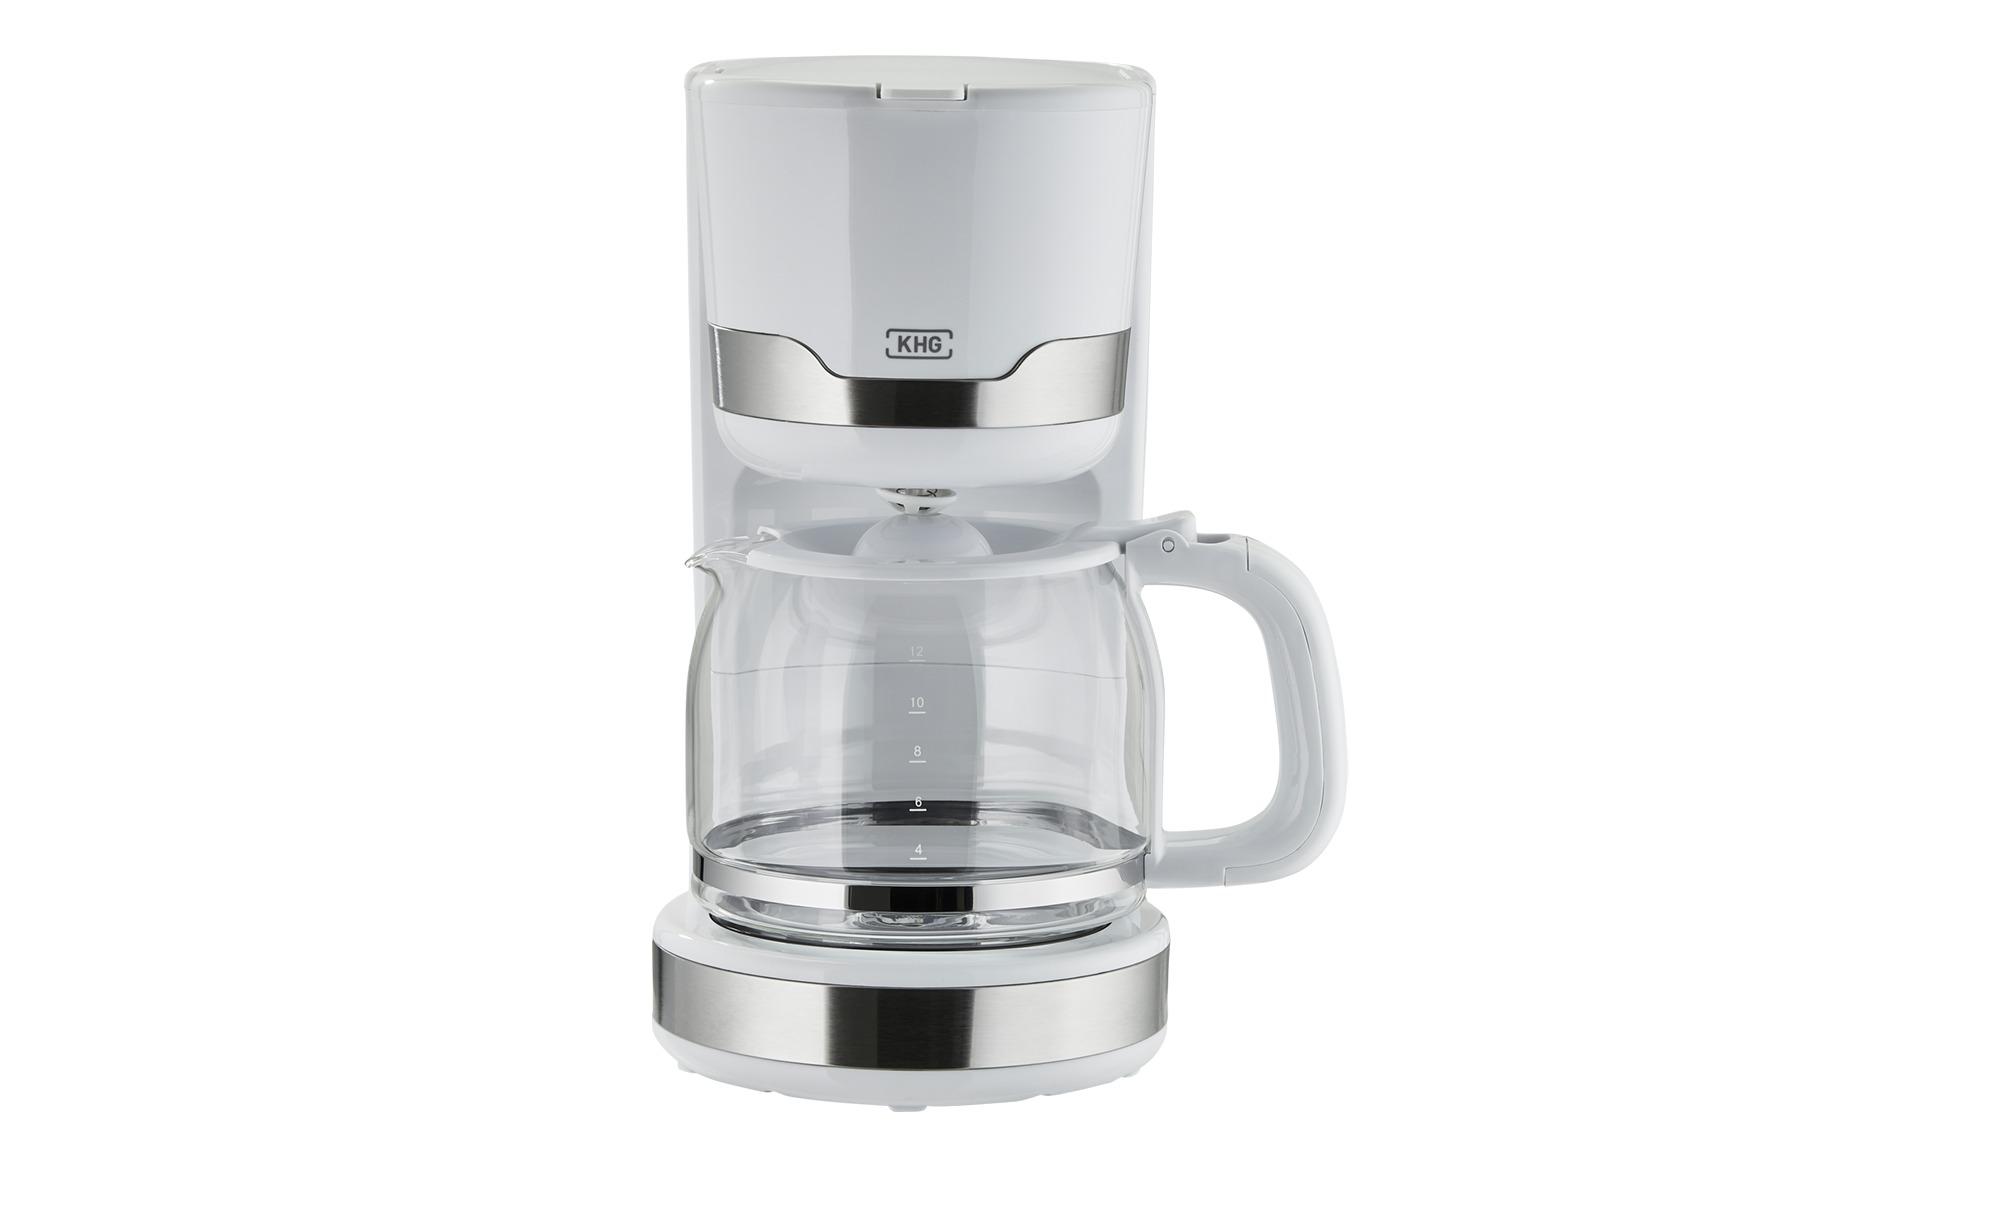 KHG Kaffeeautomat  KA-129 WE2 - weiß - Kunststoff, Glas , Edelstahl - 32 cm - 22 cm - 15,5 cm - Elektrokleingeräte > Kaffee & Espressomaschinen - Möbel Kraft | Küche und Esszimmer > Kaffee und Tee > Kaffeemaschinen | KHG